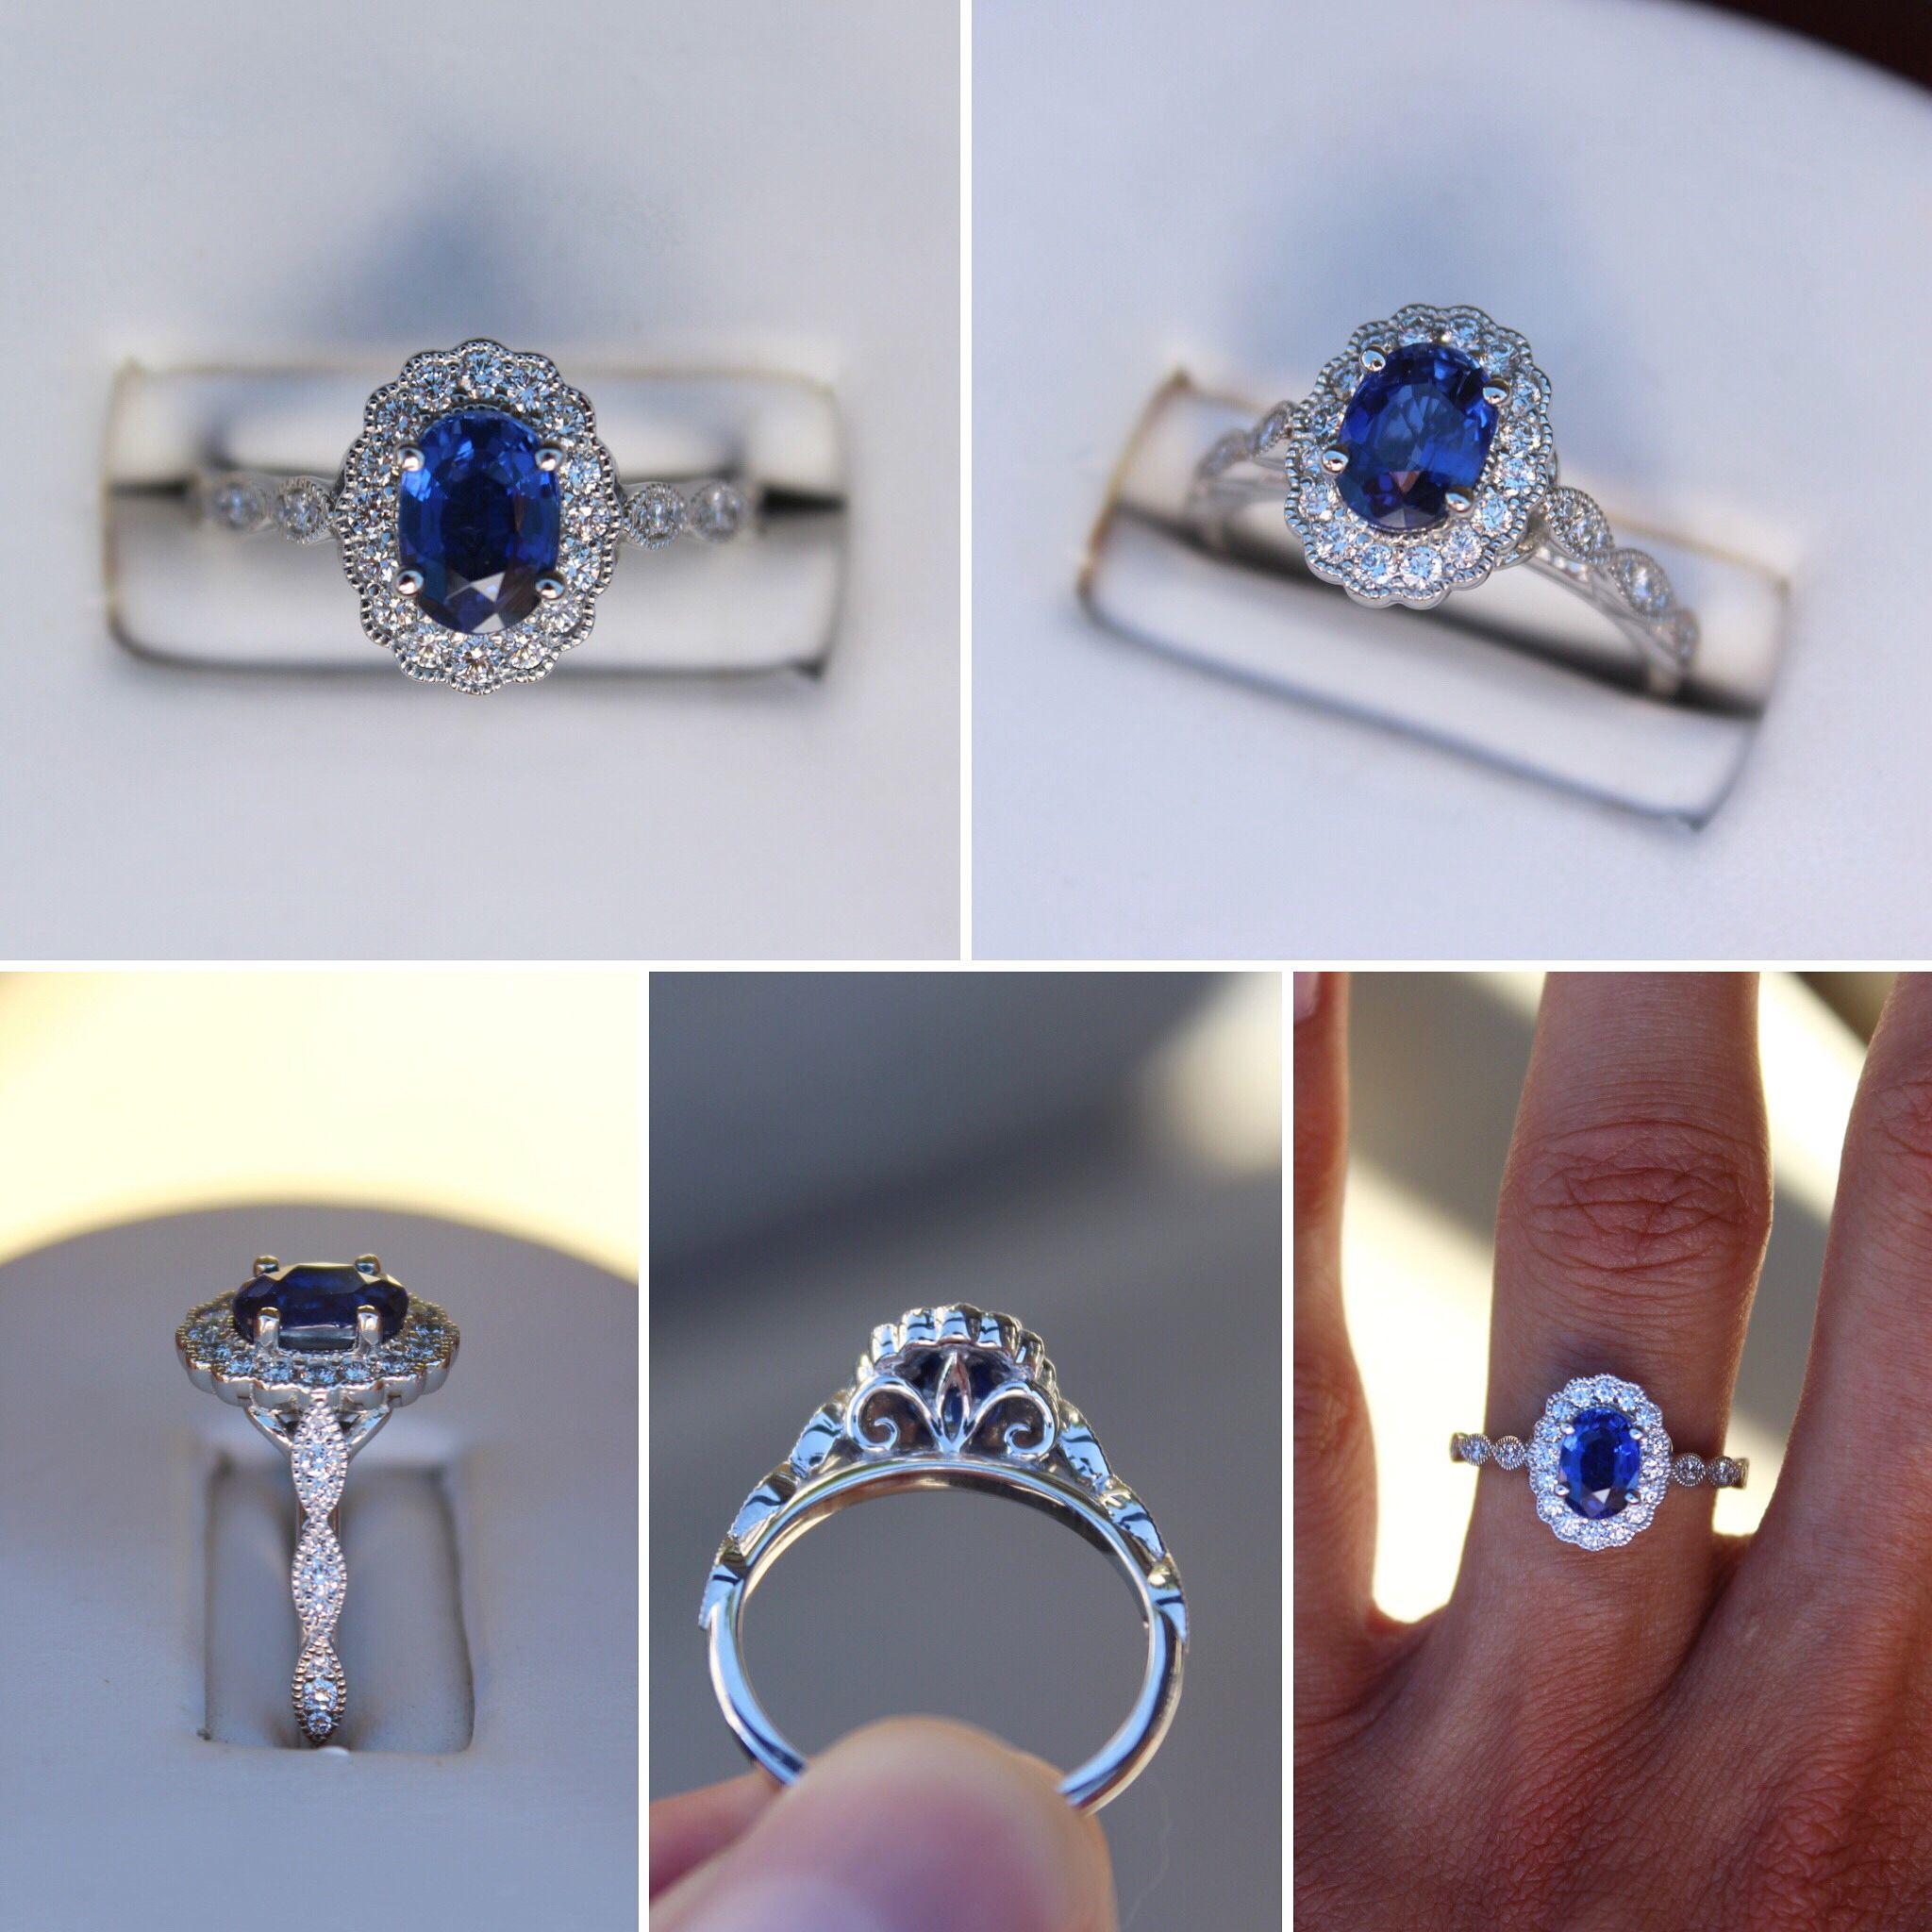 1 Carat Oval Sapphire Diamond Scalloped Halo Vintage Style Ring Gold Diamond Wedding Band Engagement Rings Sapphire Engagement Ring White Gold